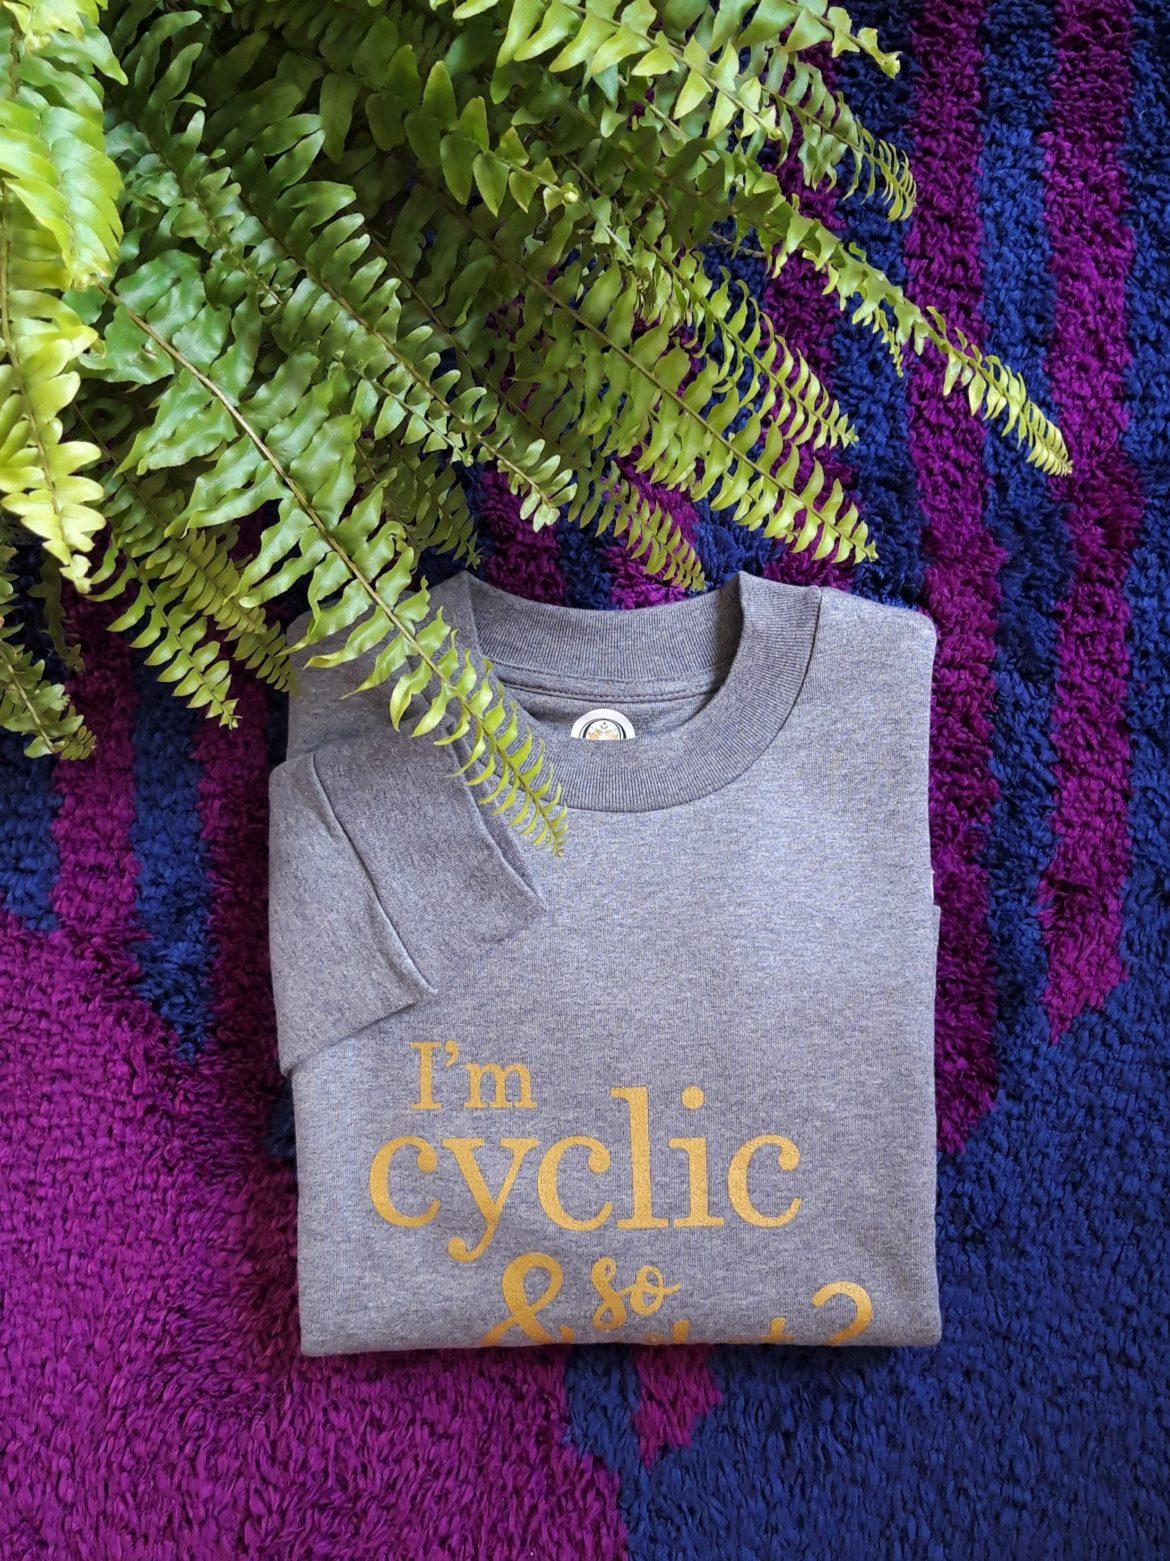 Mon sweat I'm cyclic & so what?